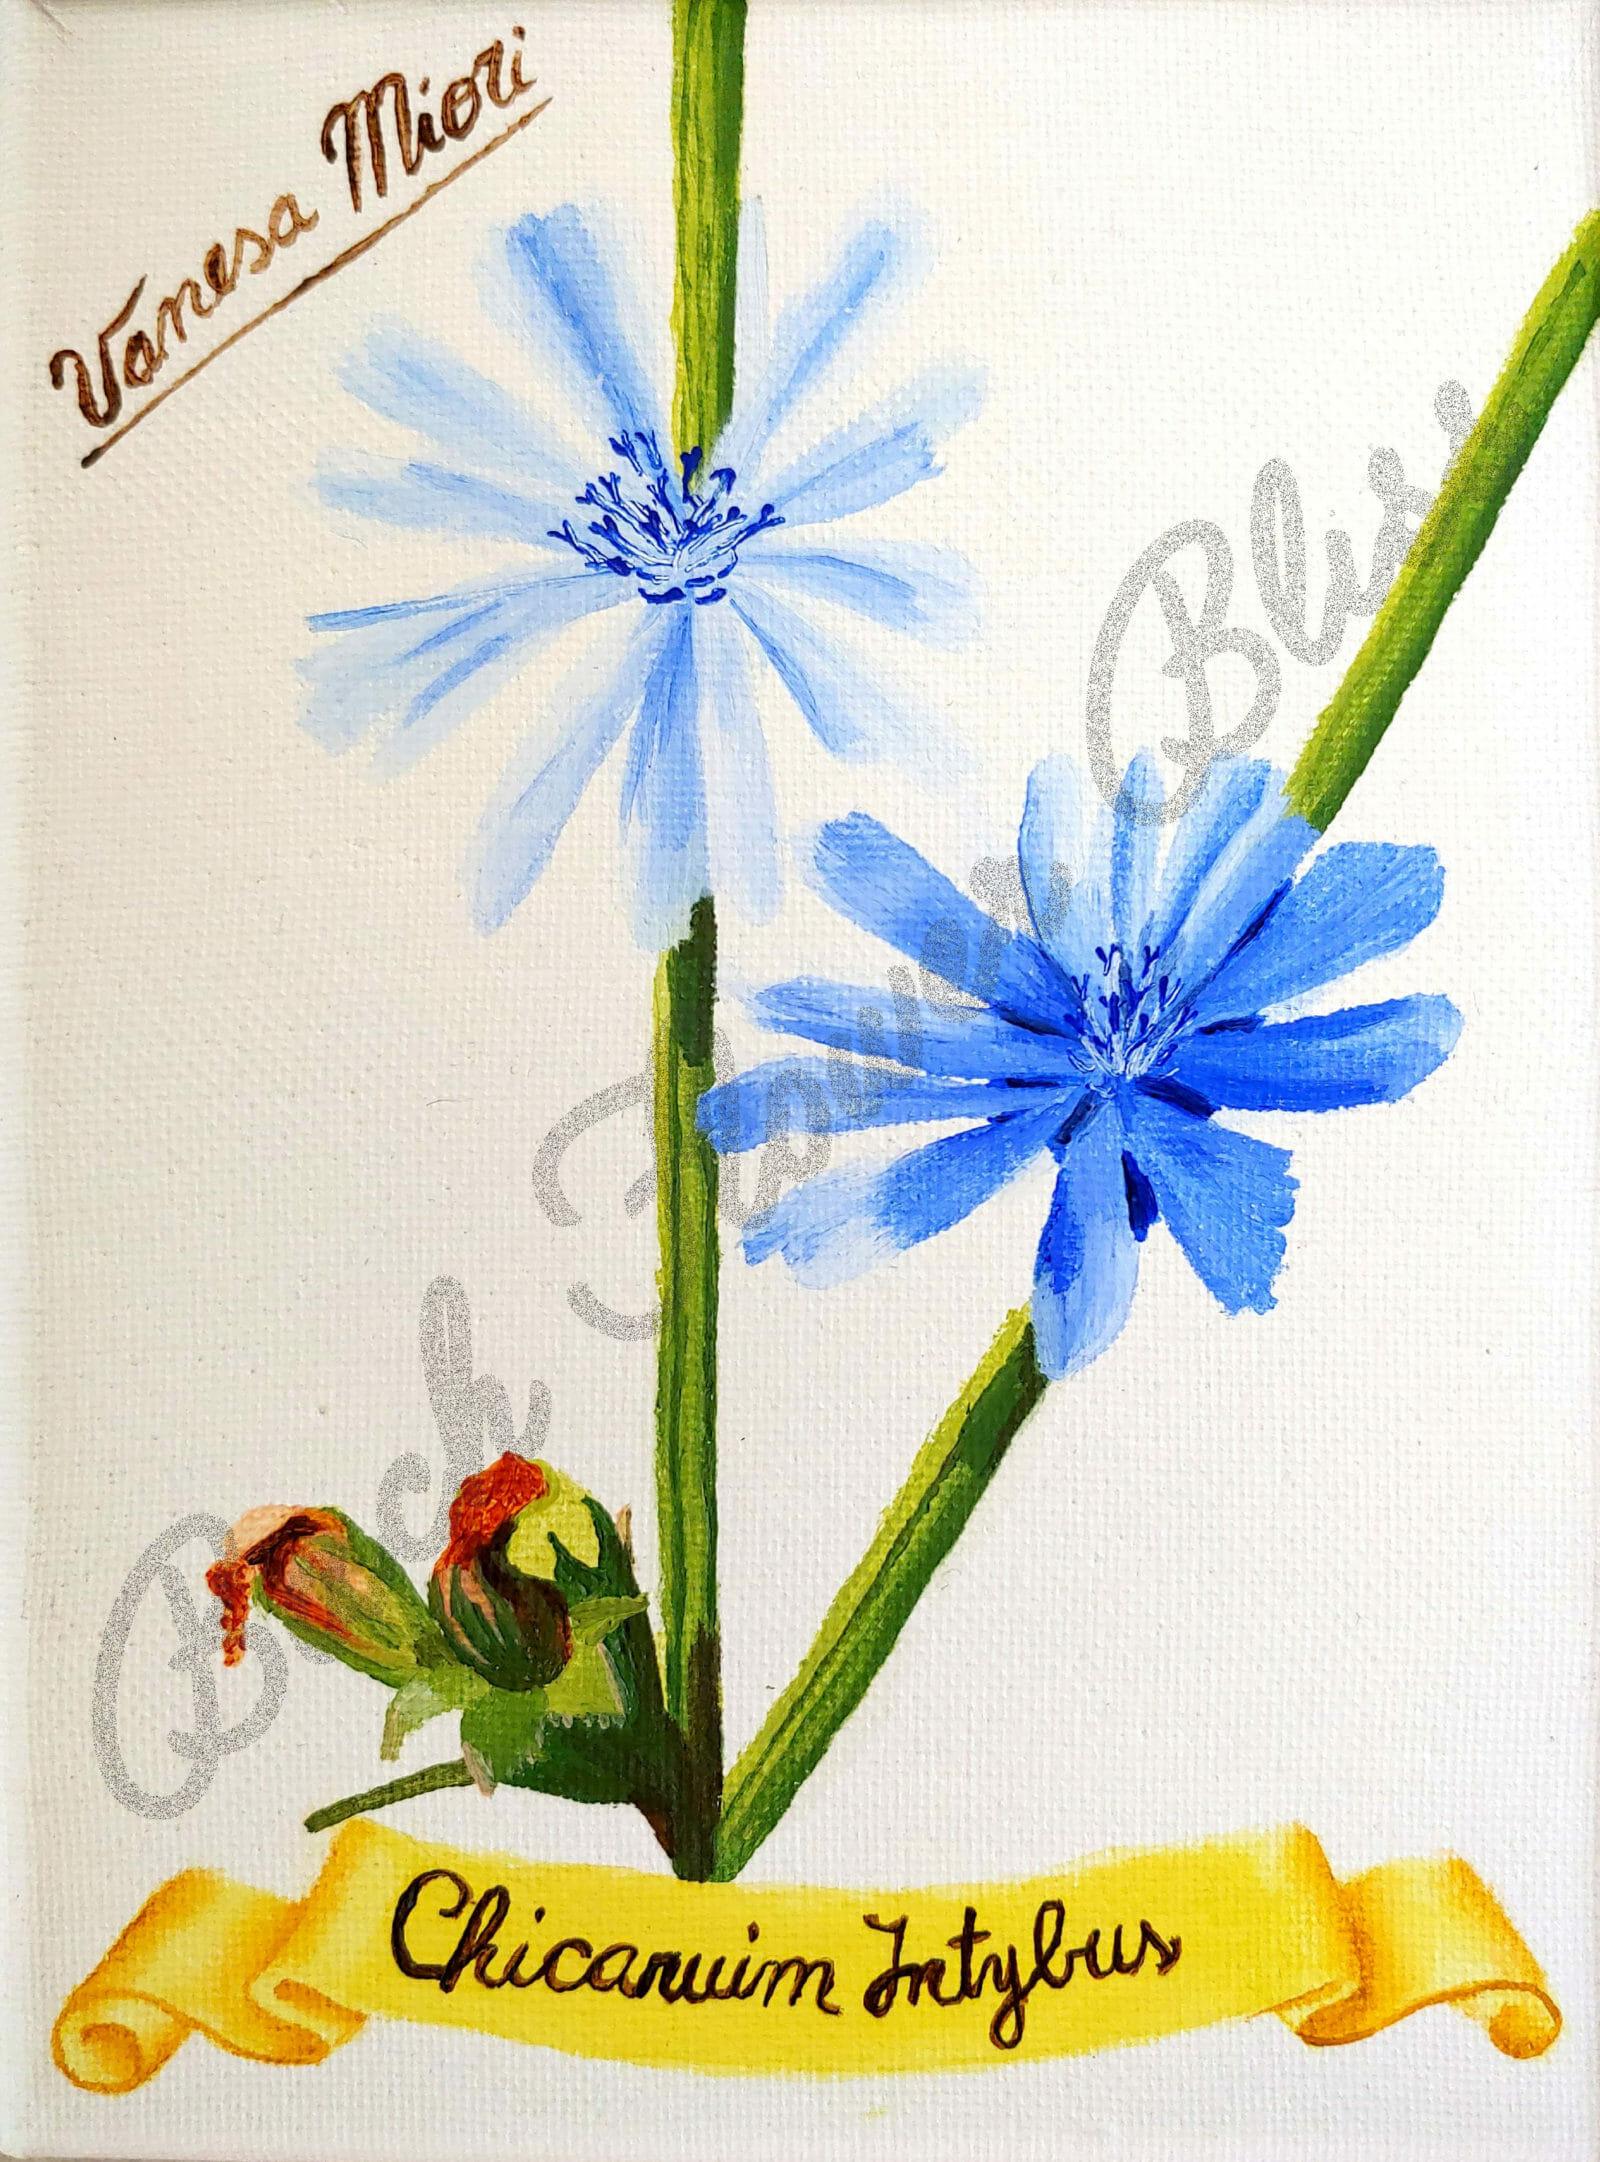 Chicory flower Friday